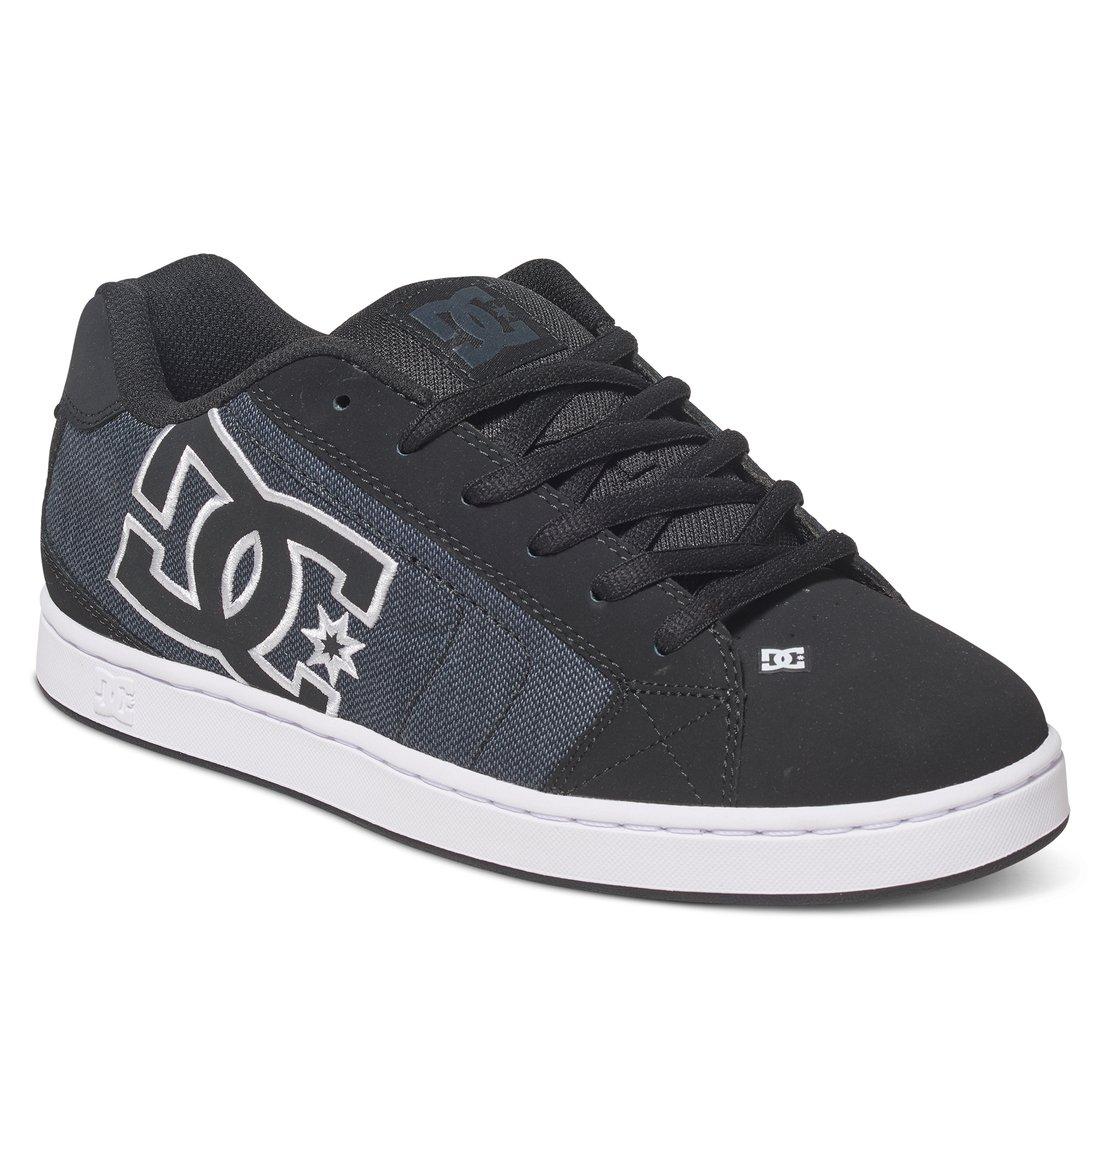 DC ShoesNET SE - Skate shoes - black HaW7KRD